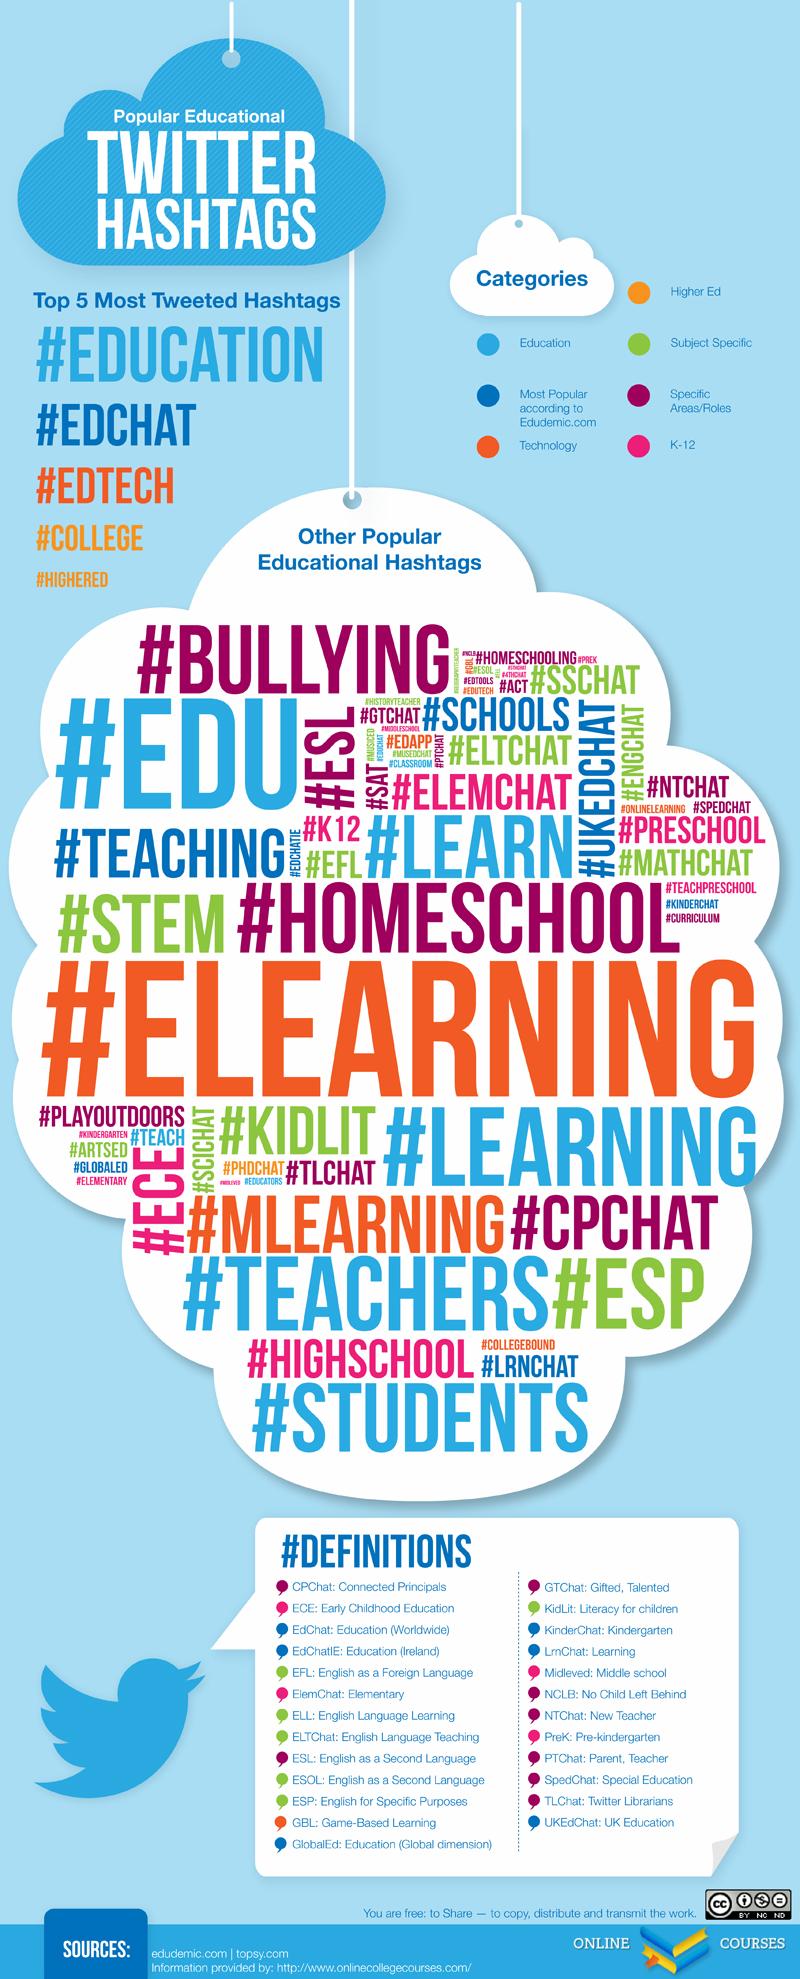 exploring educational hashtags on twitter